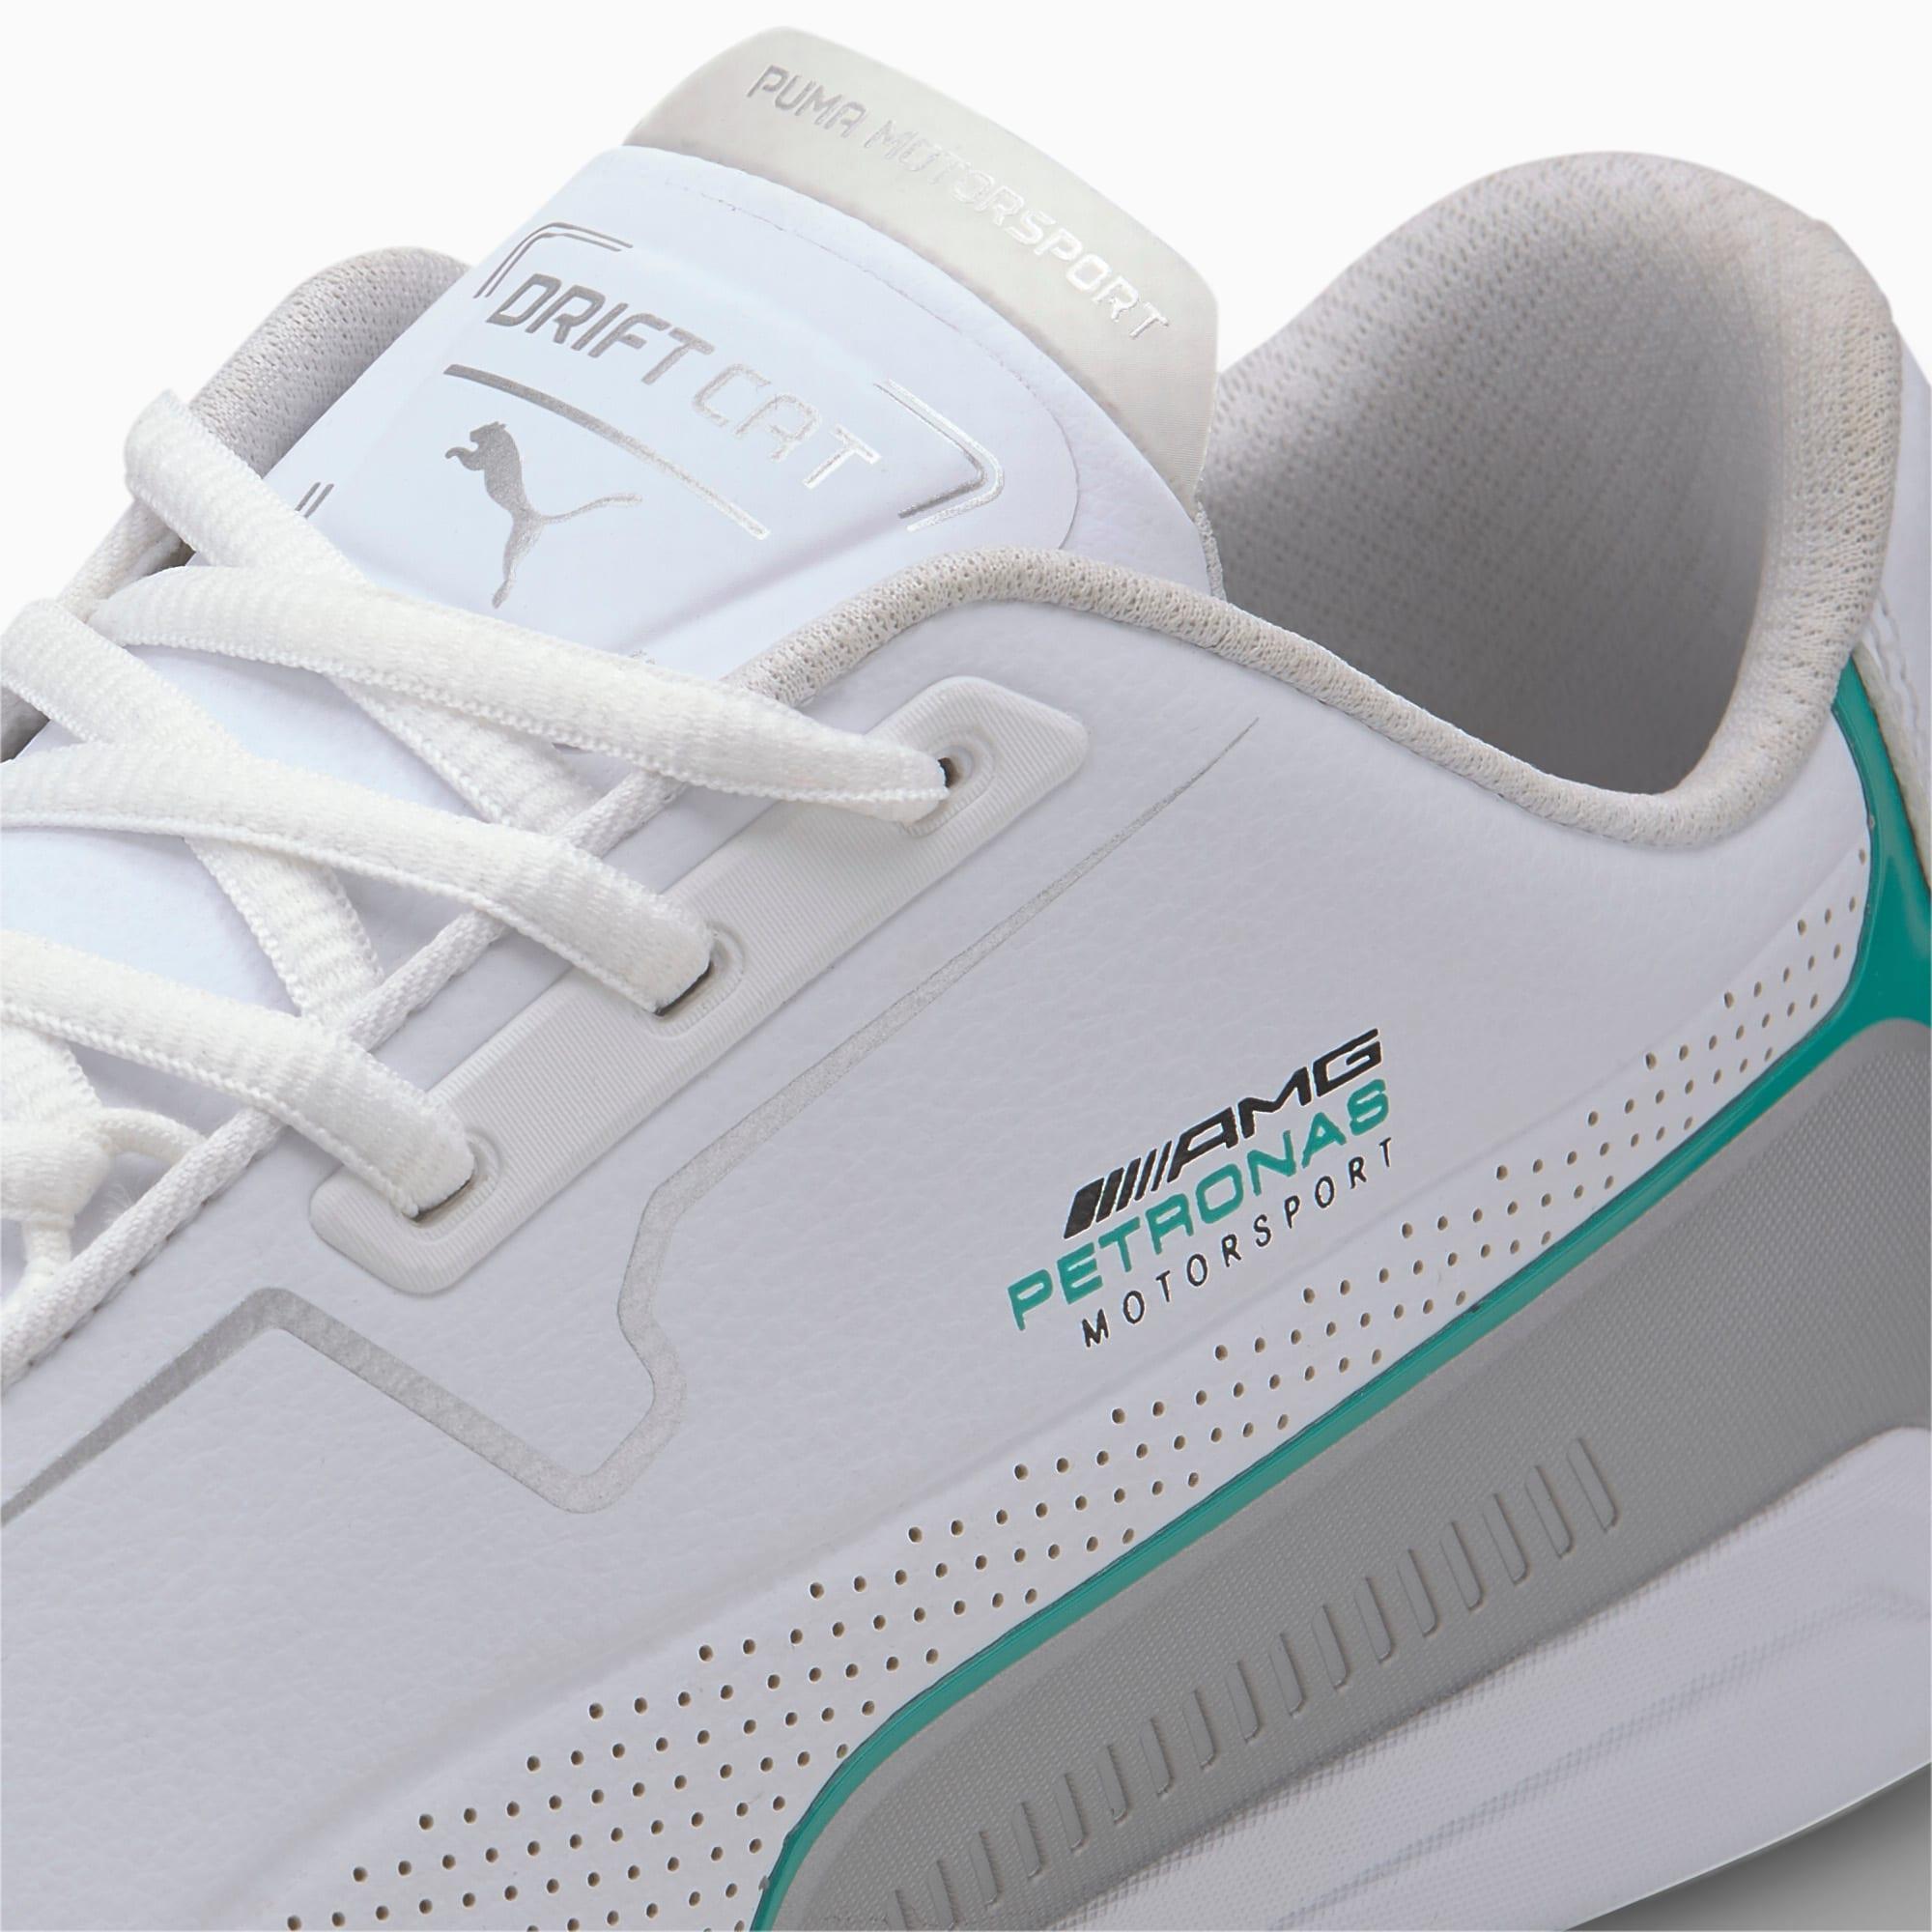 amg petronas motorsport shoes